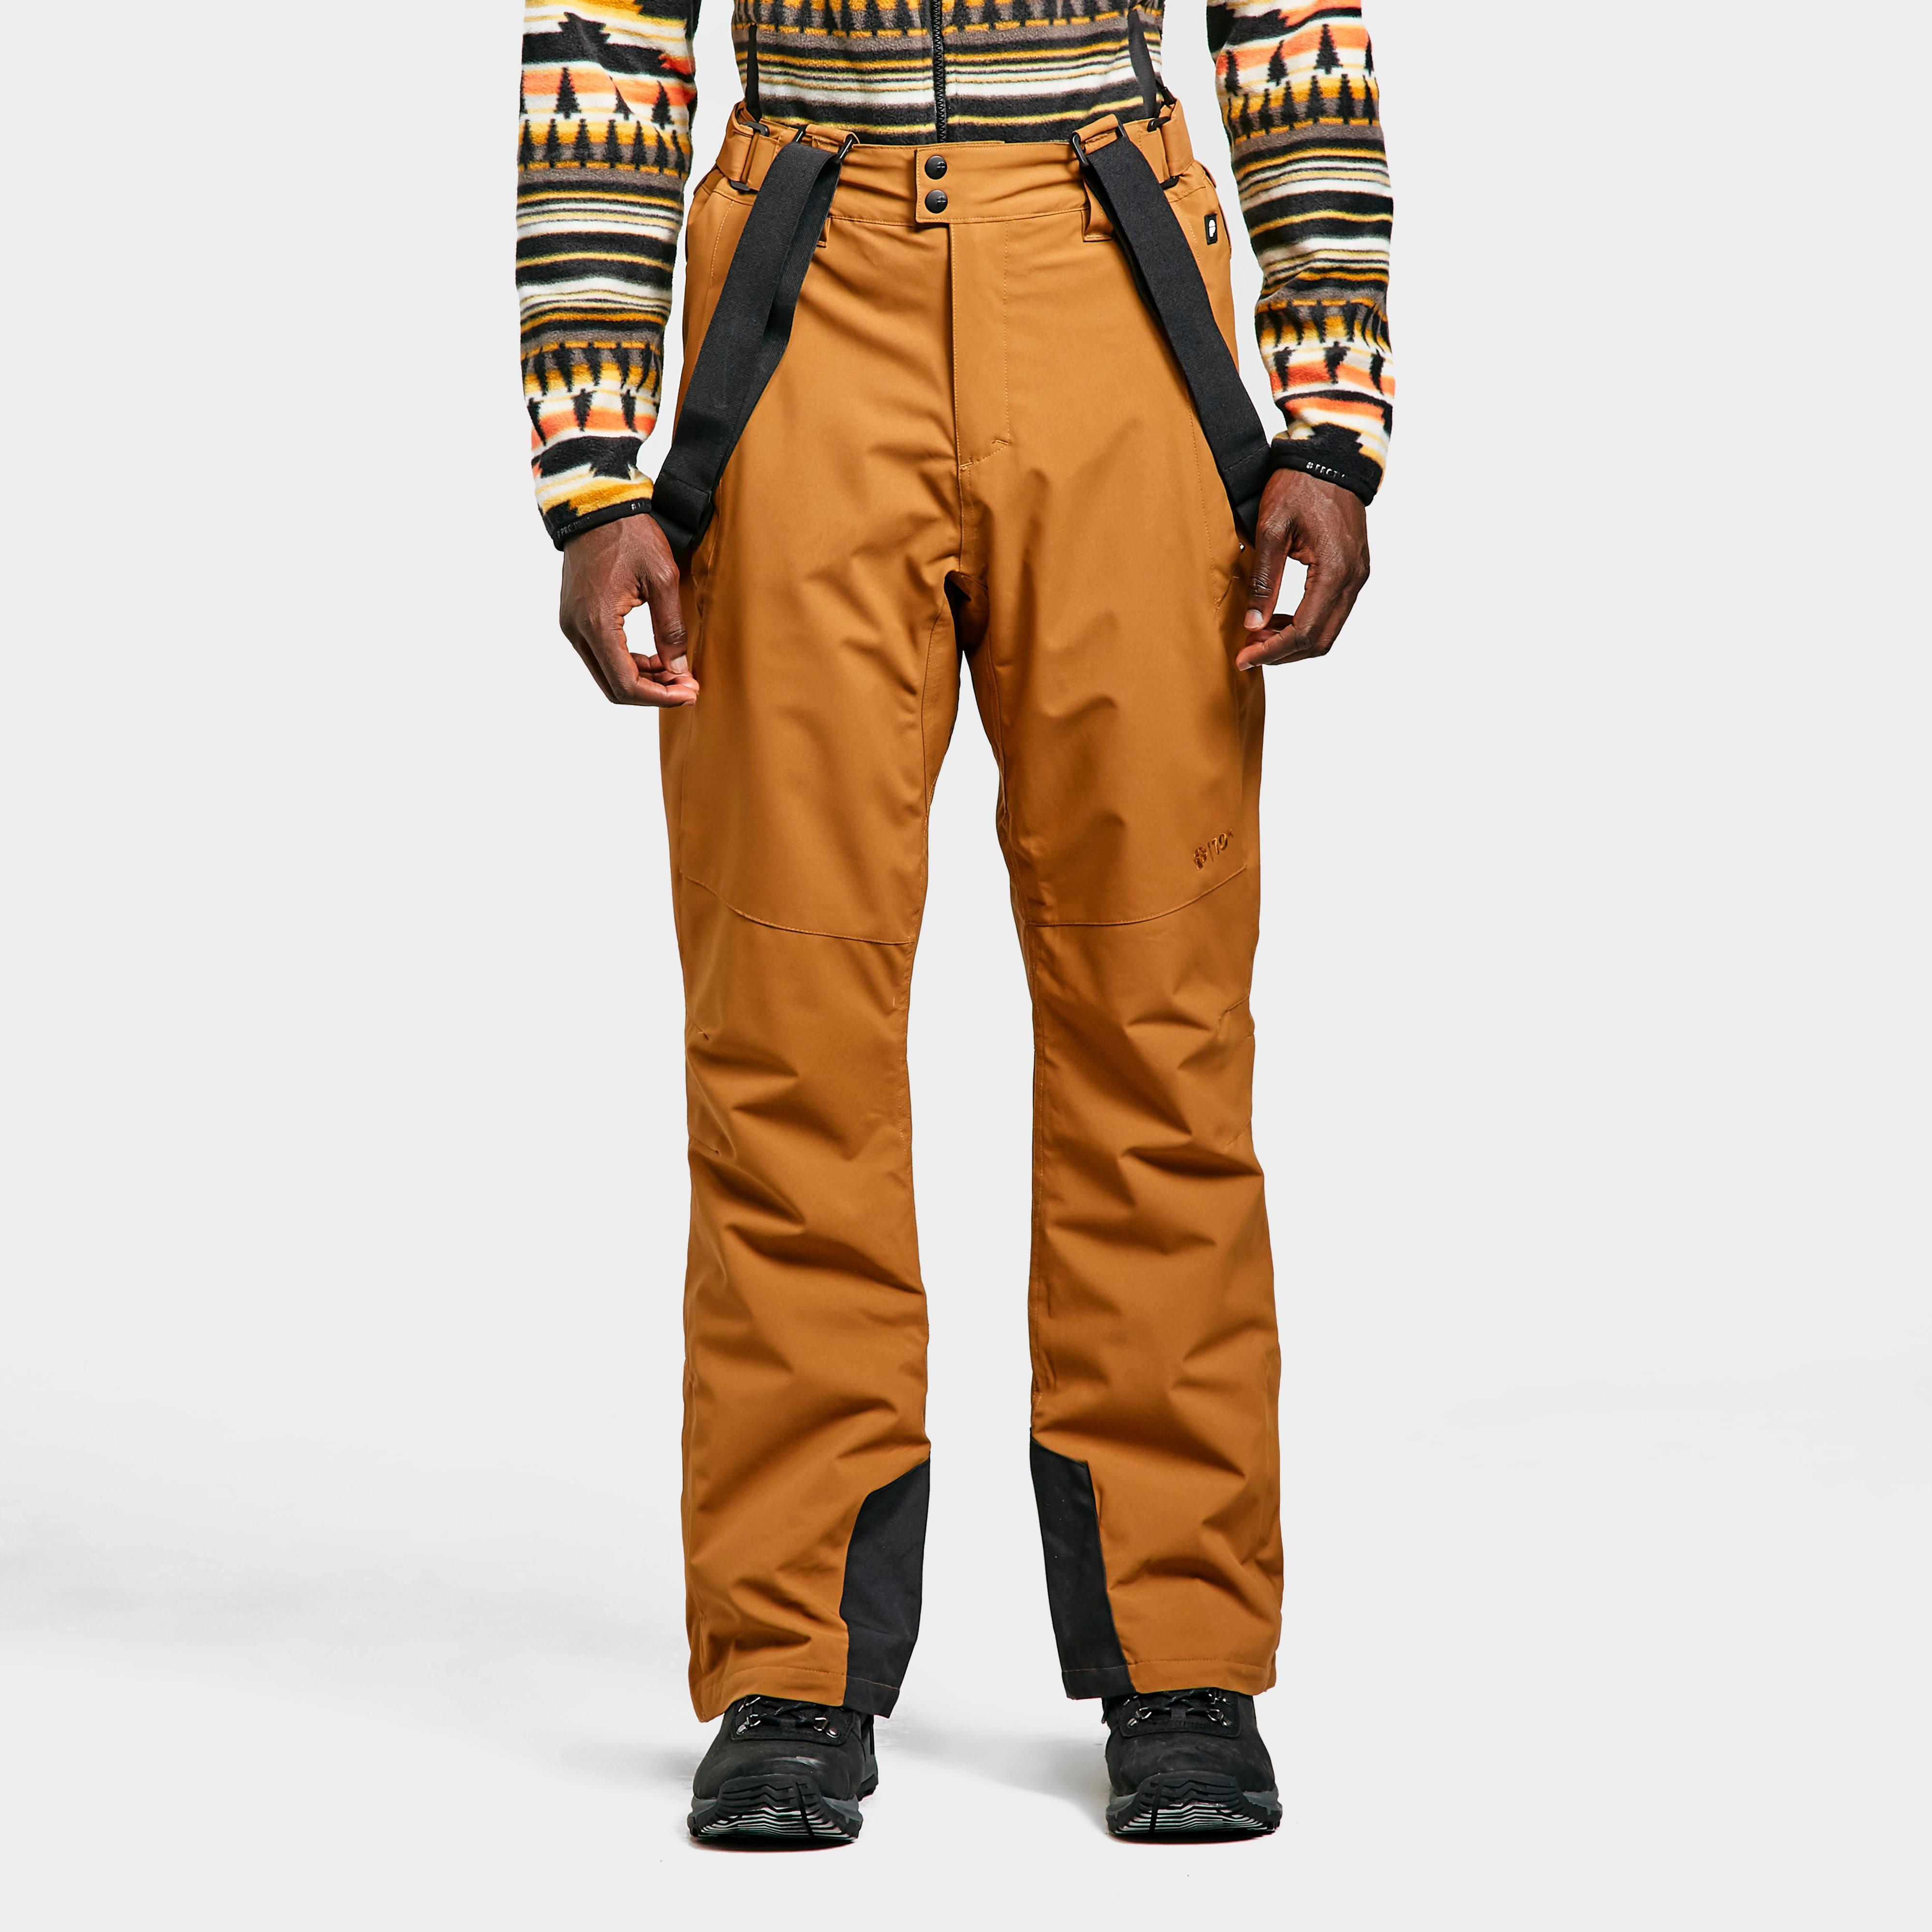 Protest Men's Owens Ski Pants - Orange/Brn, Orange